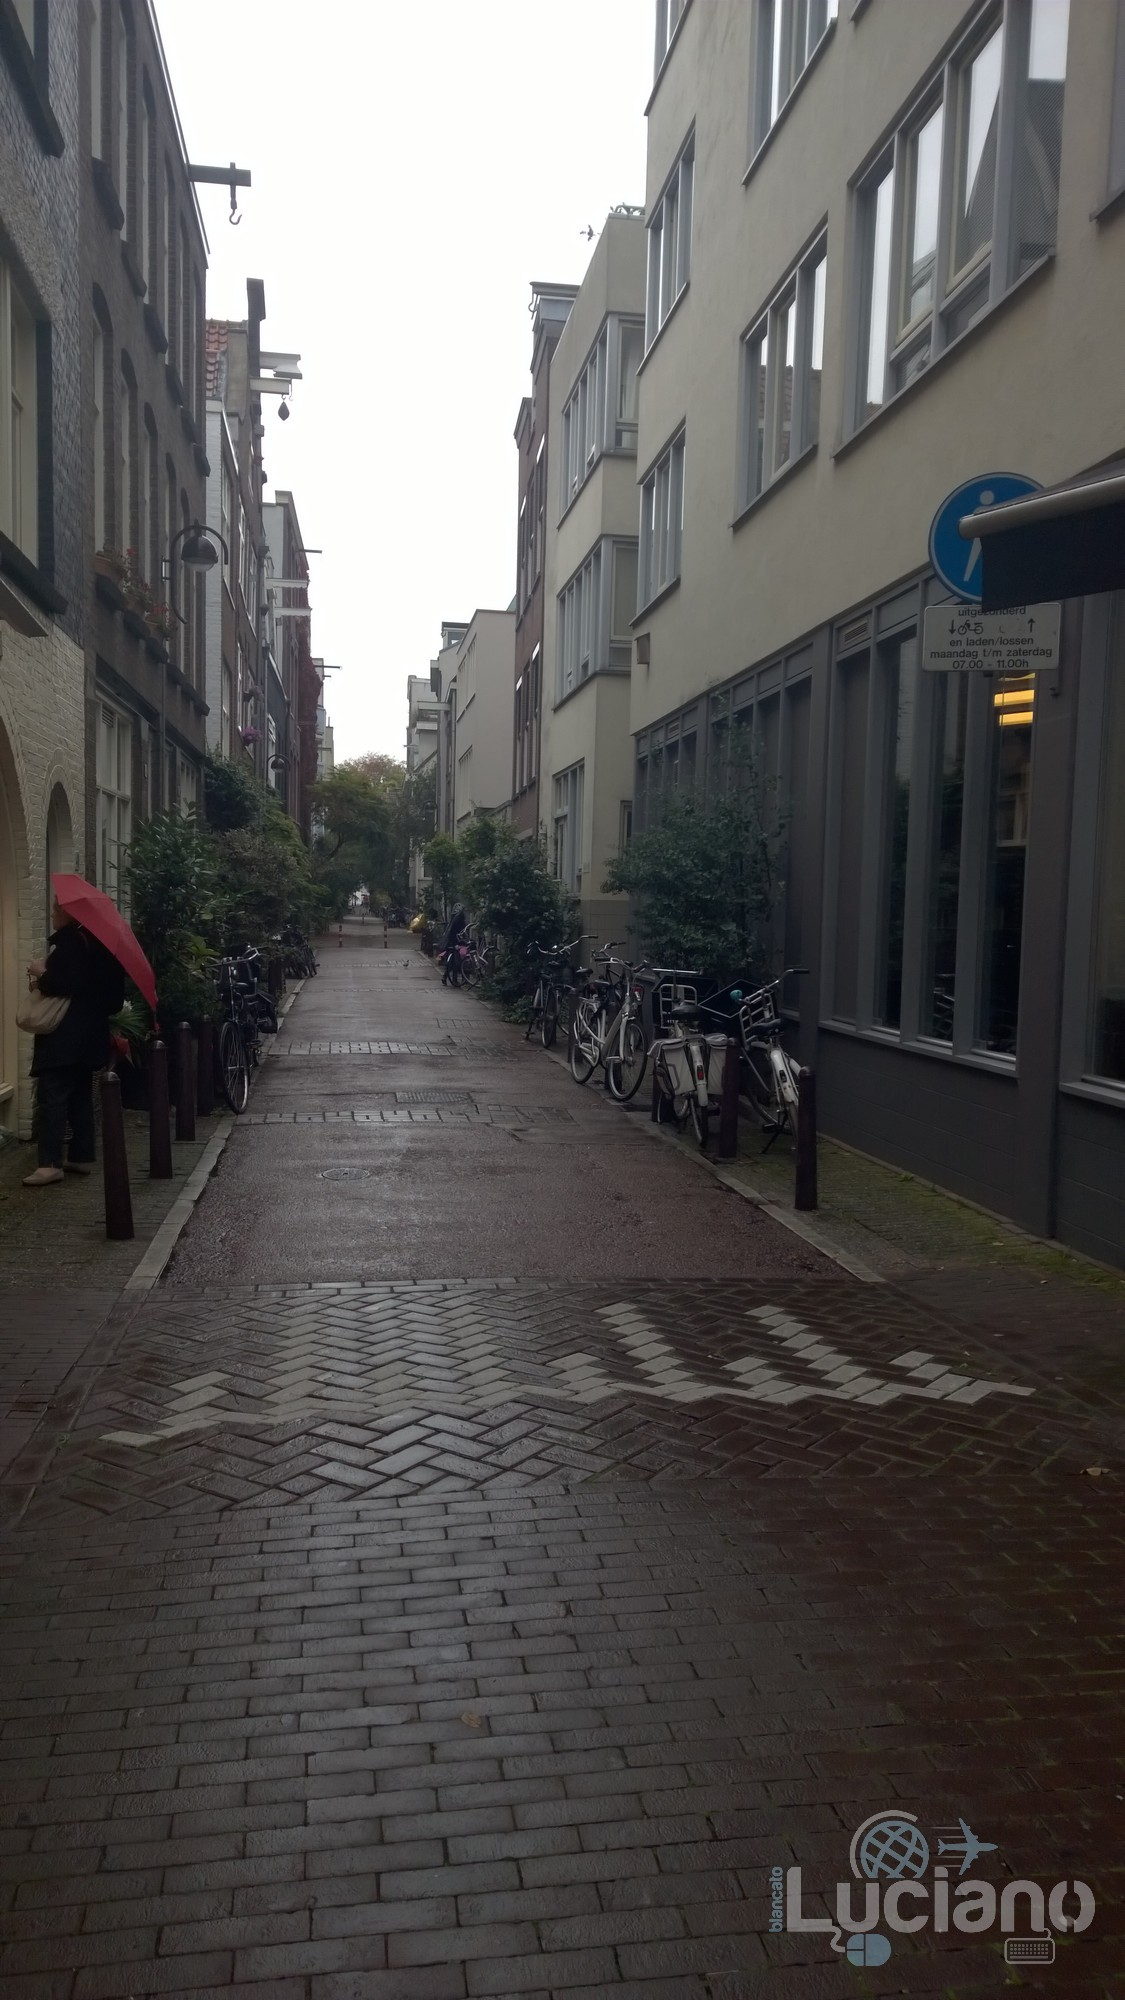 amsterdam-2014-vueling-lucianoblancatoit (174)